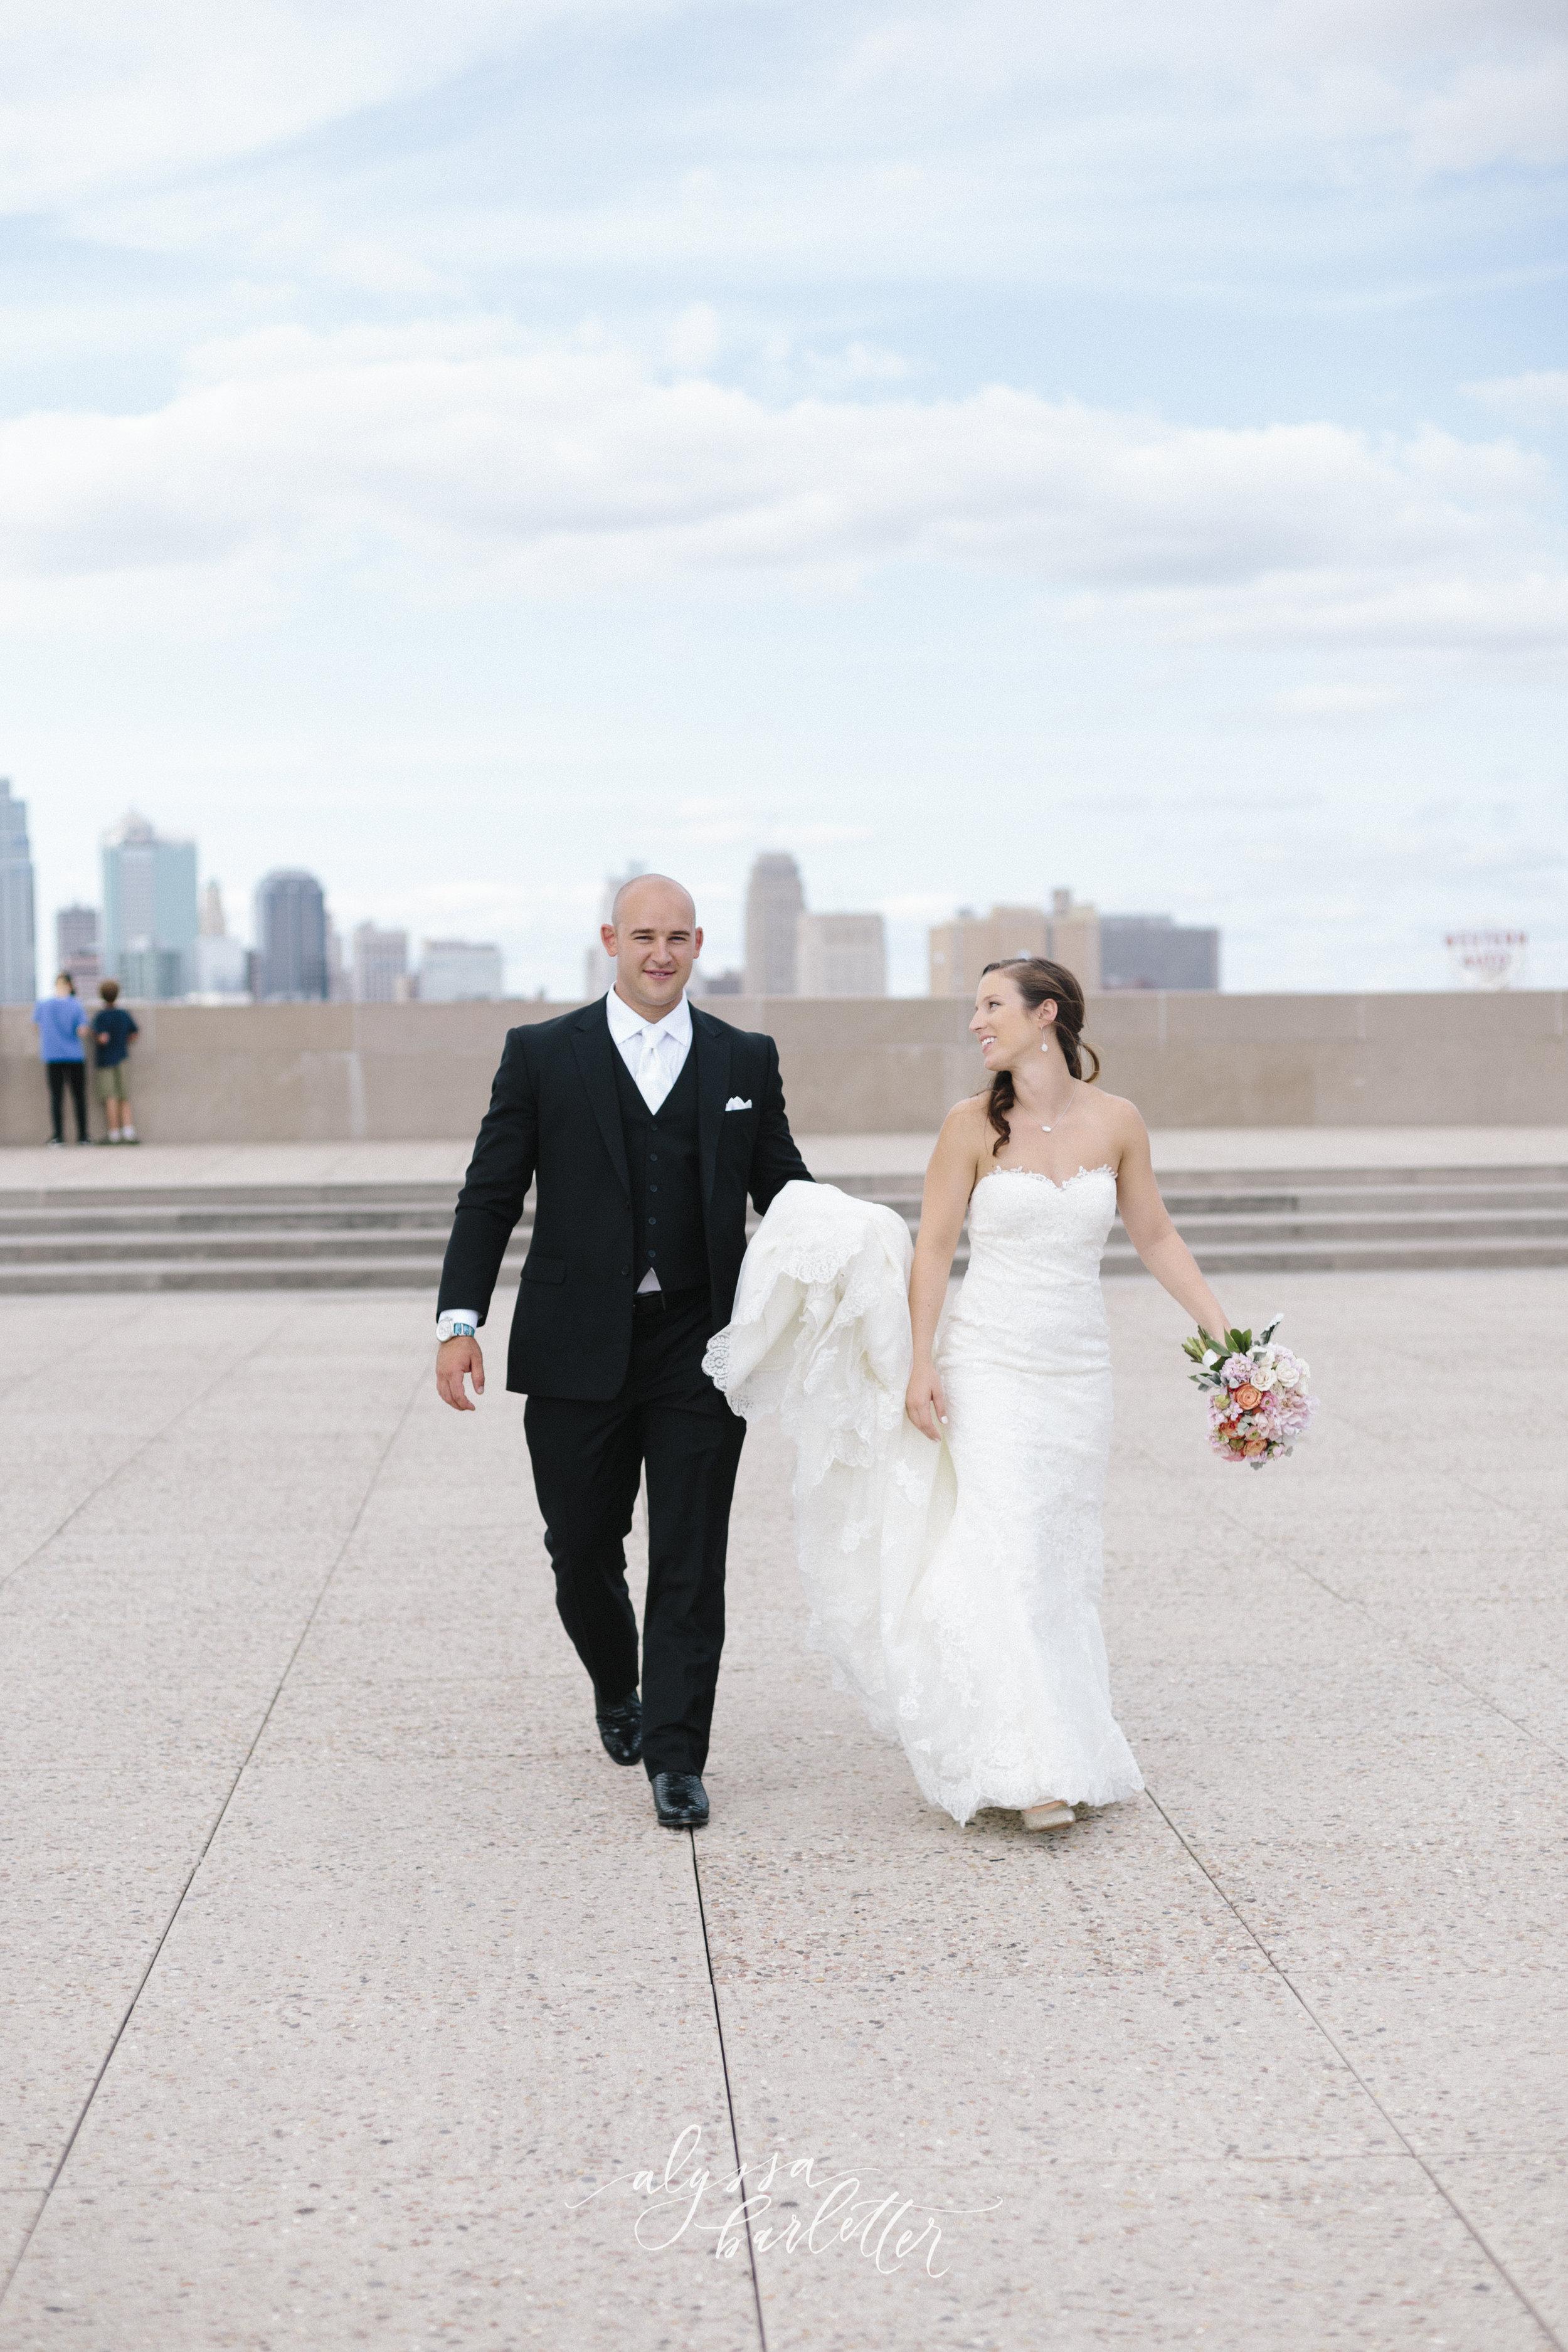 kansas city wedding photography wwi liberty memorial bride groom skyline